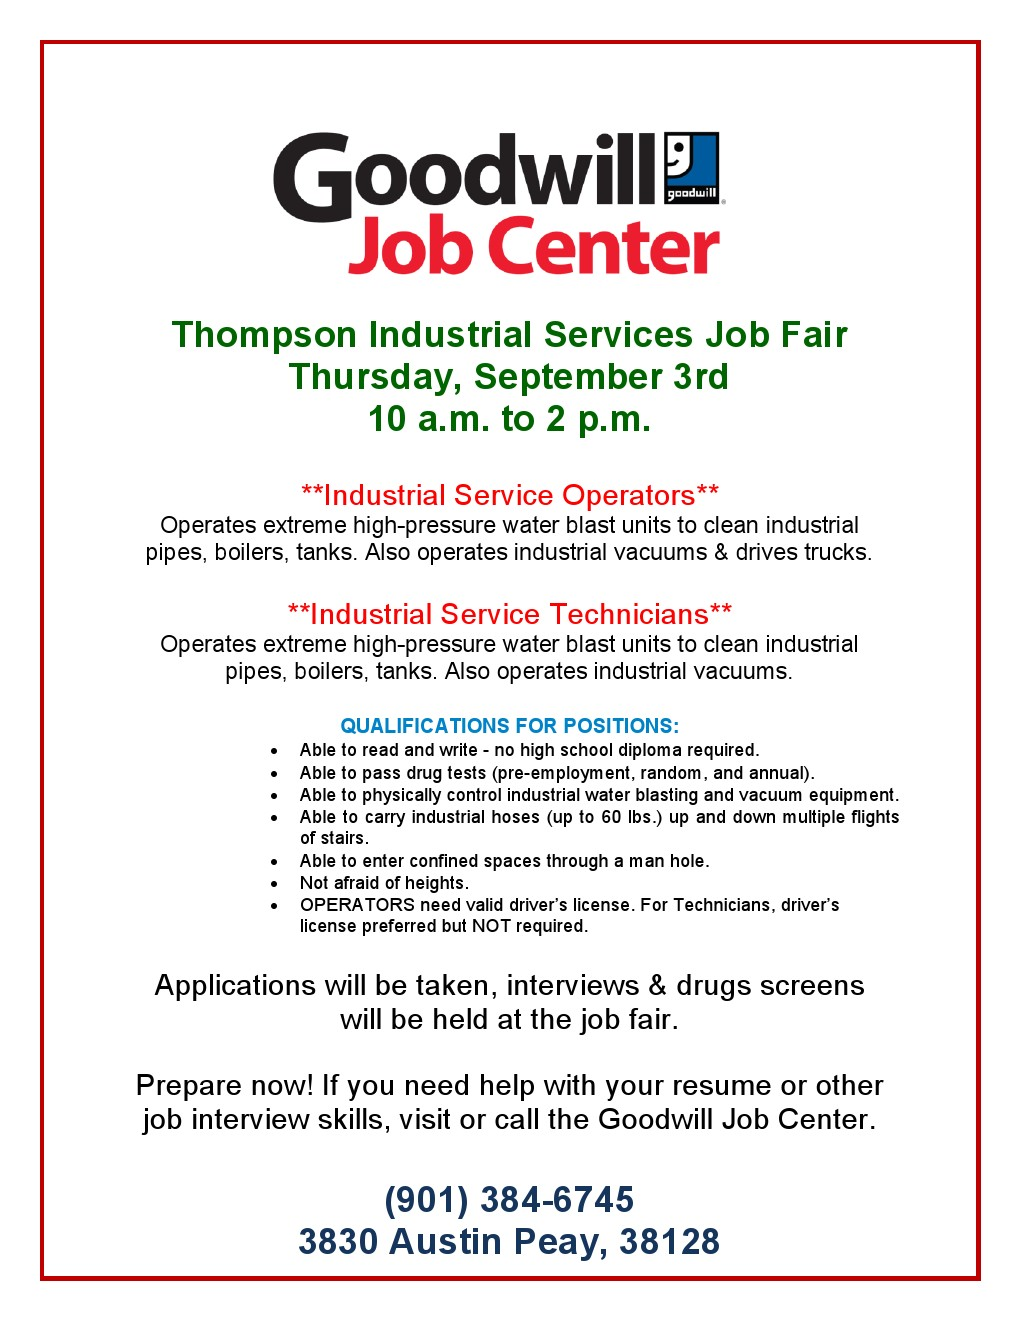 Thompson Industrial Services Job Fair – September 3 | Job & Career ...